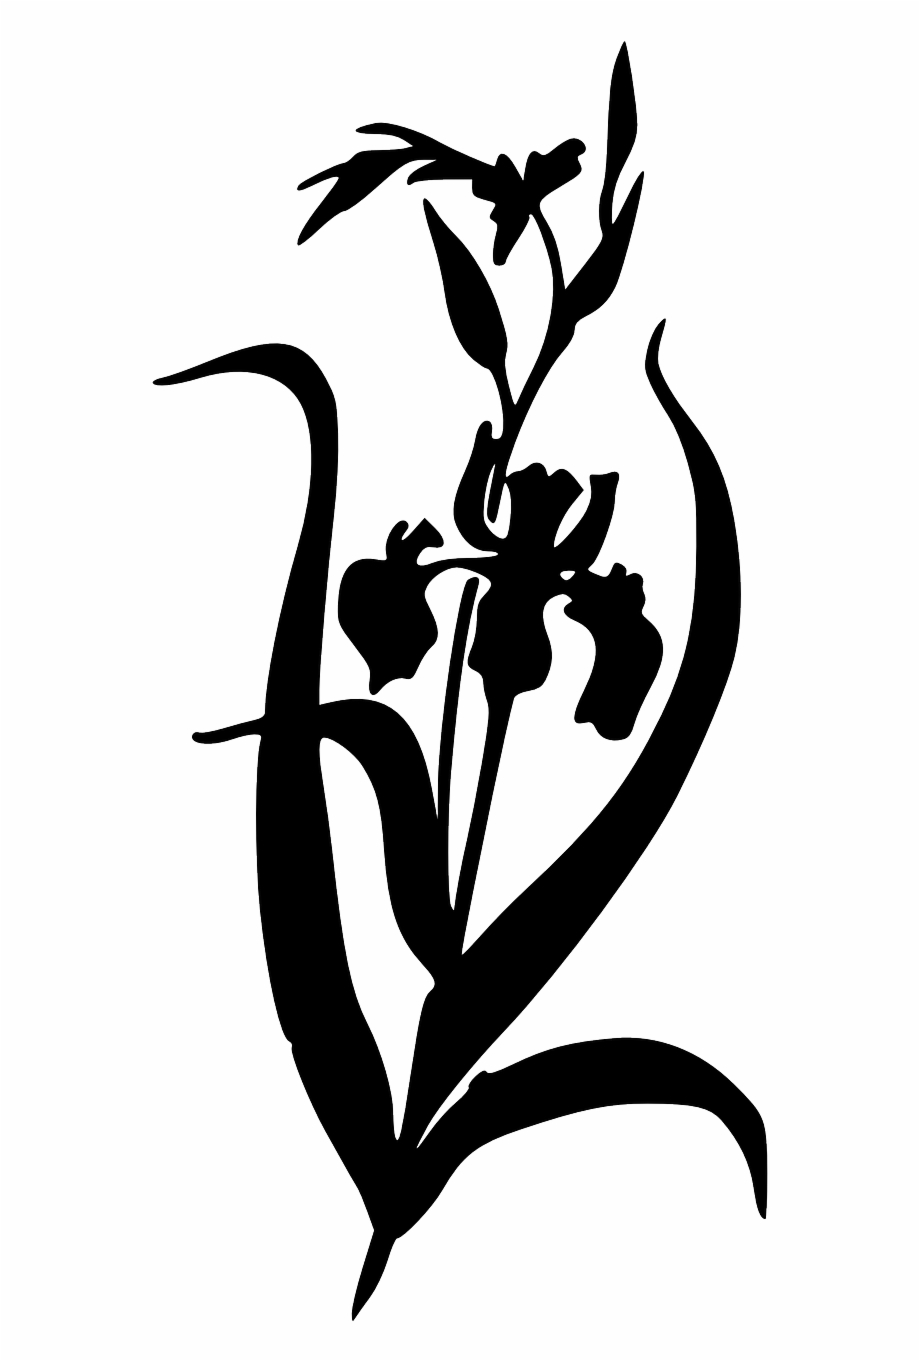 Iris clipart black and white banner transparent Silhouette Iris Plants Black Png Image - Iris Flower Clipart ... banner transparent